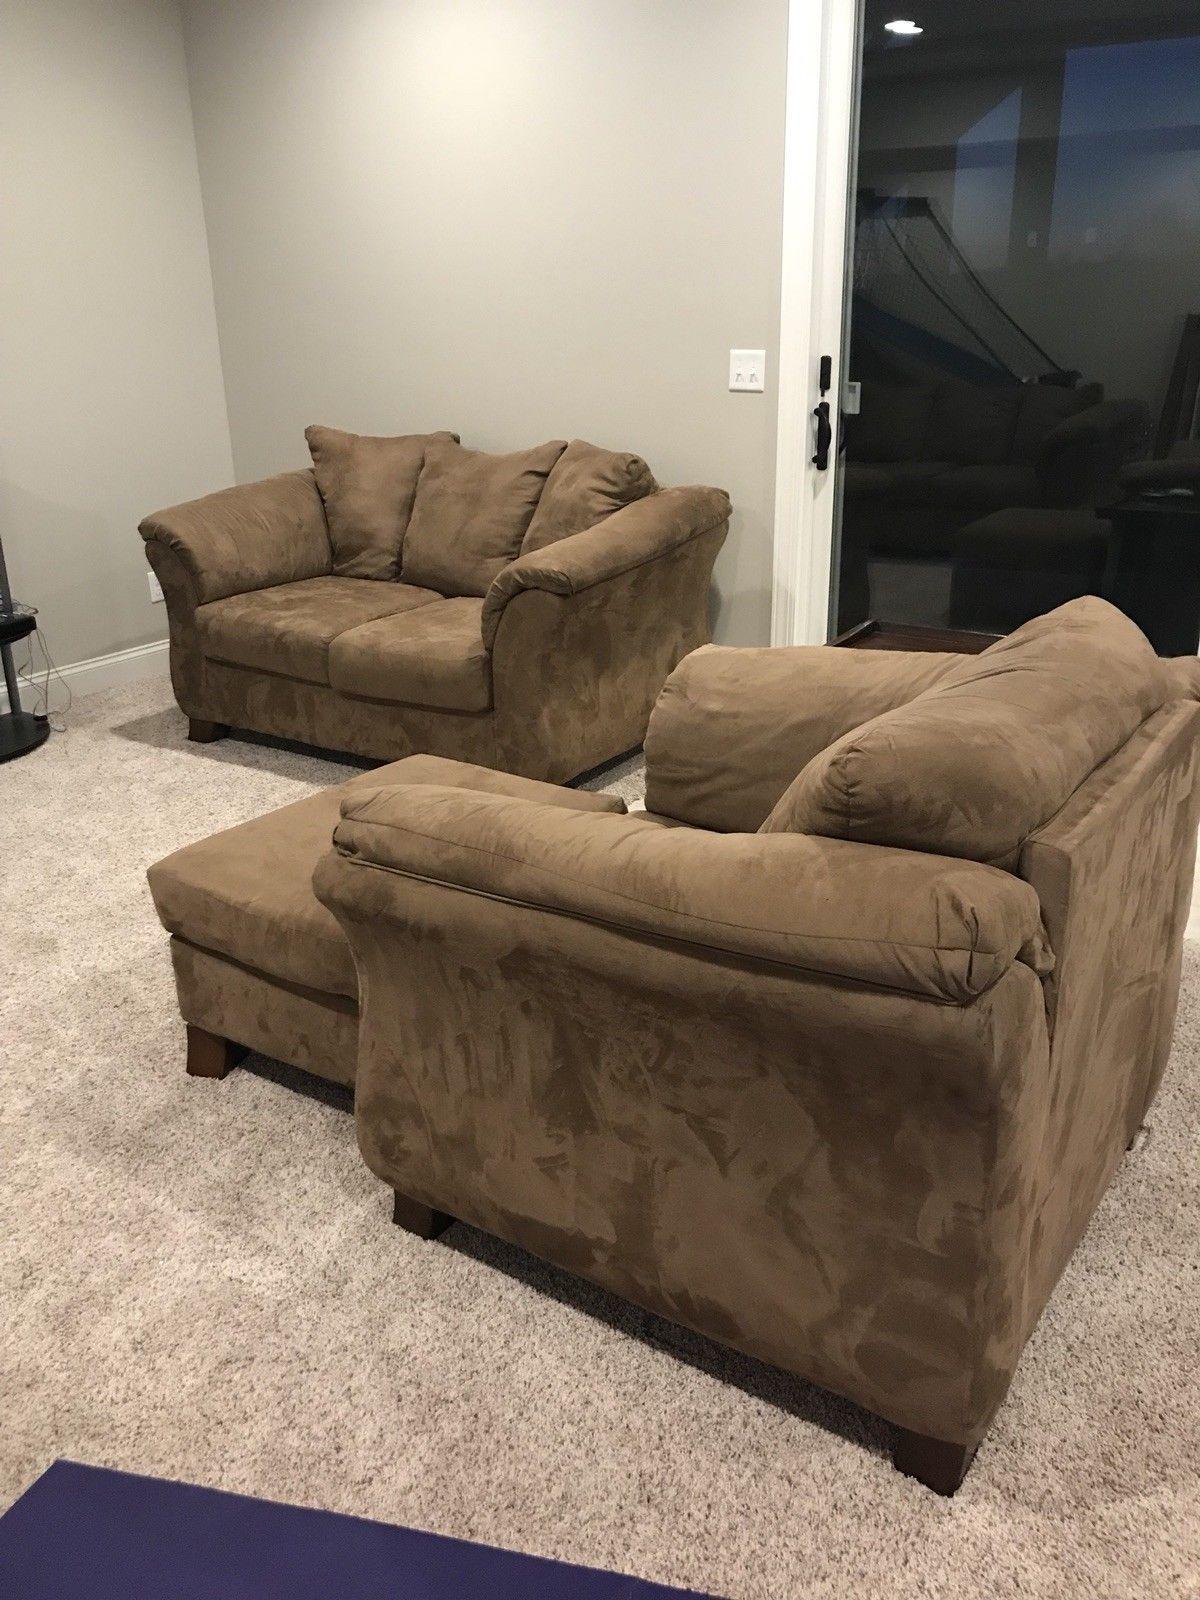 Miraculous 750 00 Couch Loveseat Chair And Ottoman Loveseat Uwap Interior Chair Design Uwaporg